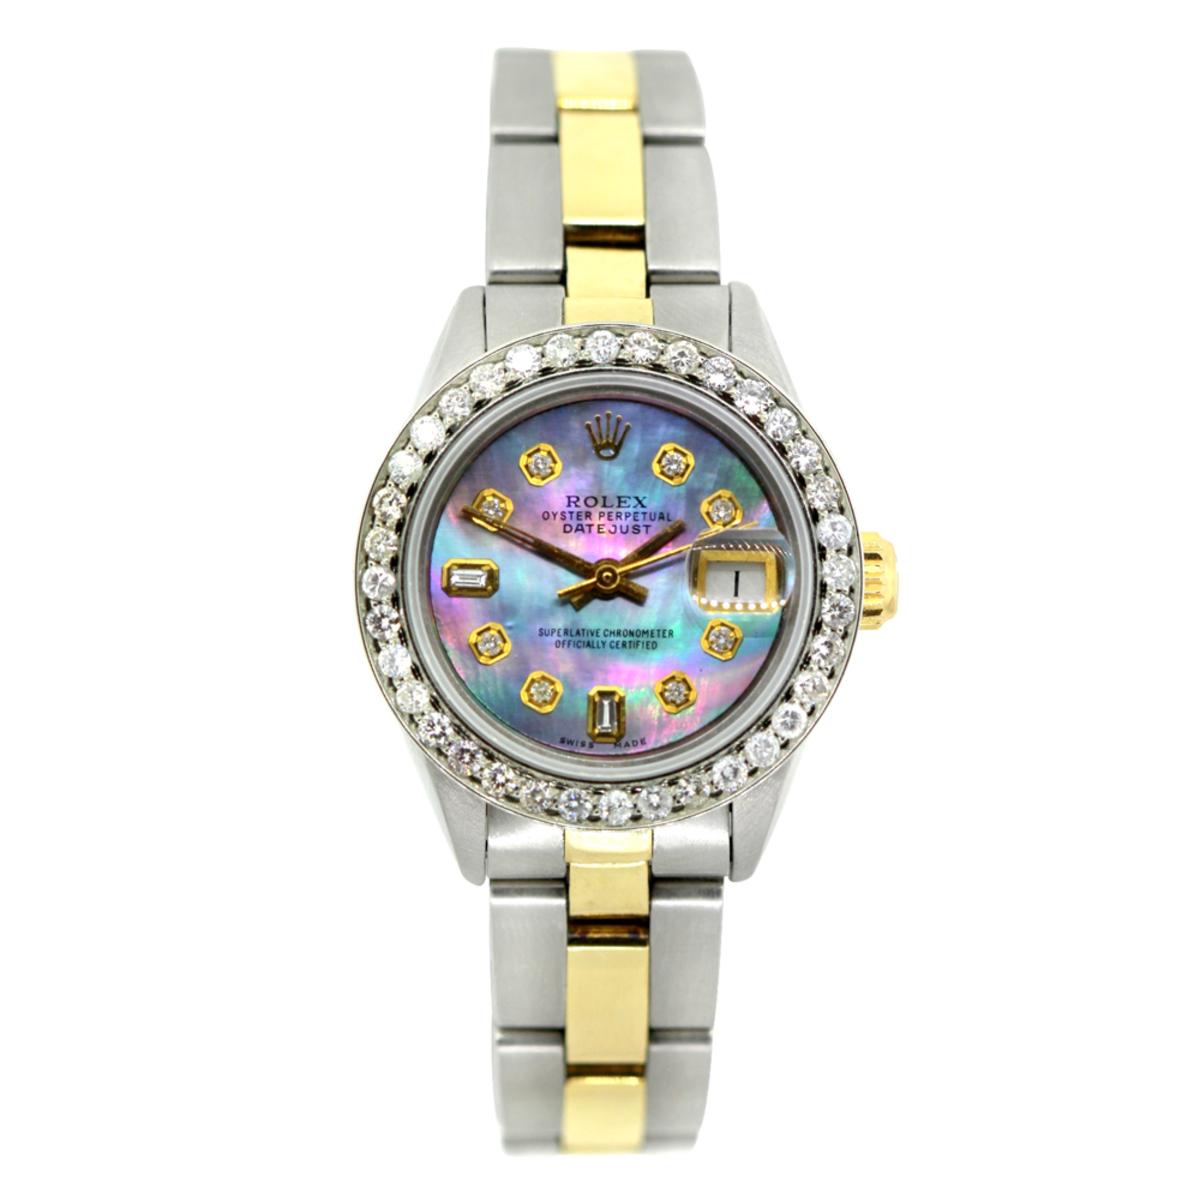 Rolex Datejust Ladies Custom Diamond Watch Stainless Steel & 18k Gold 1.2ct